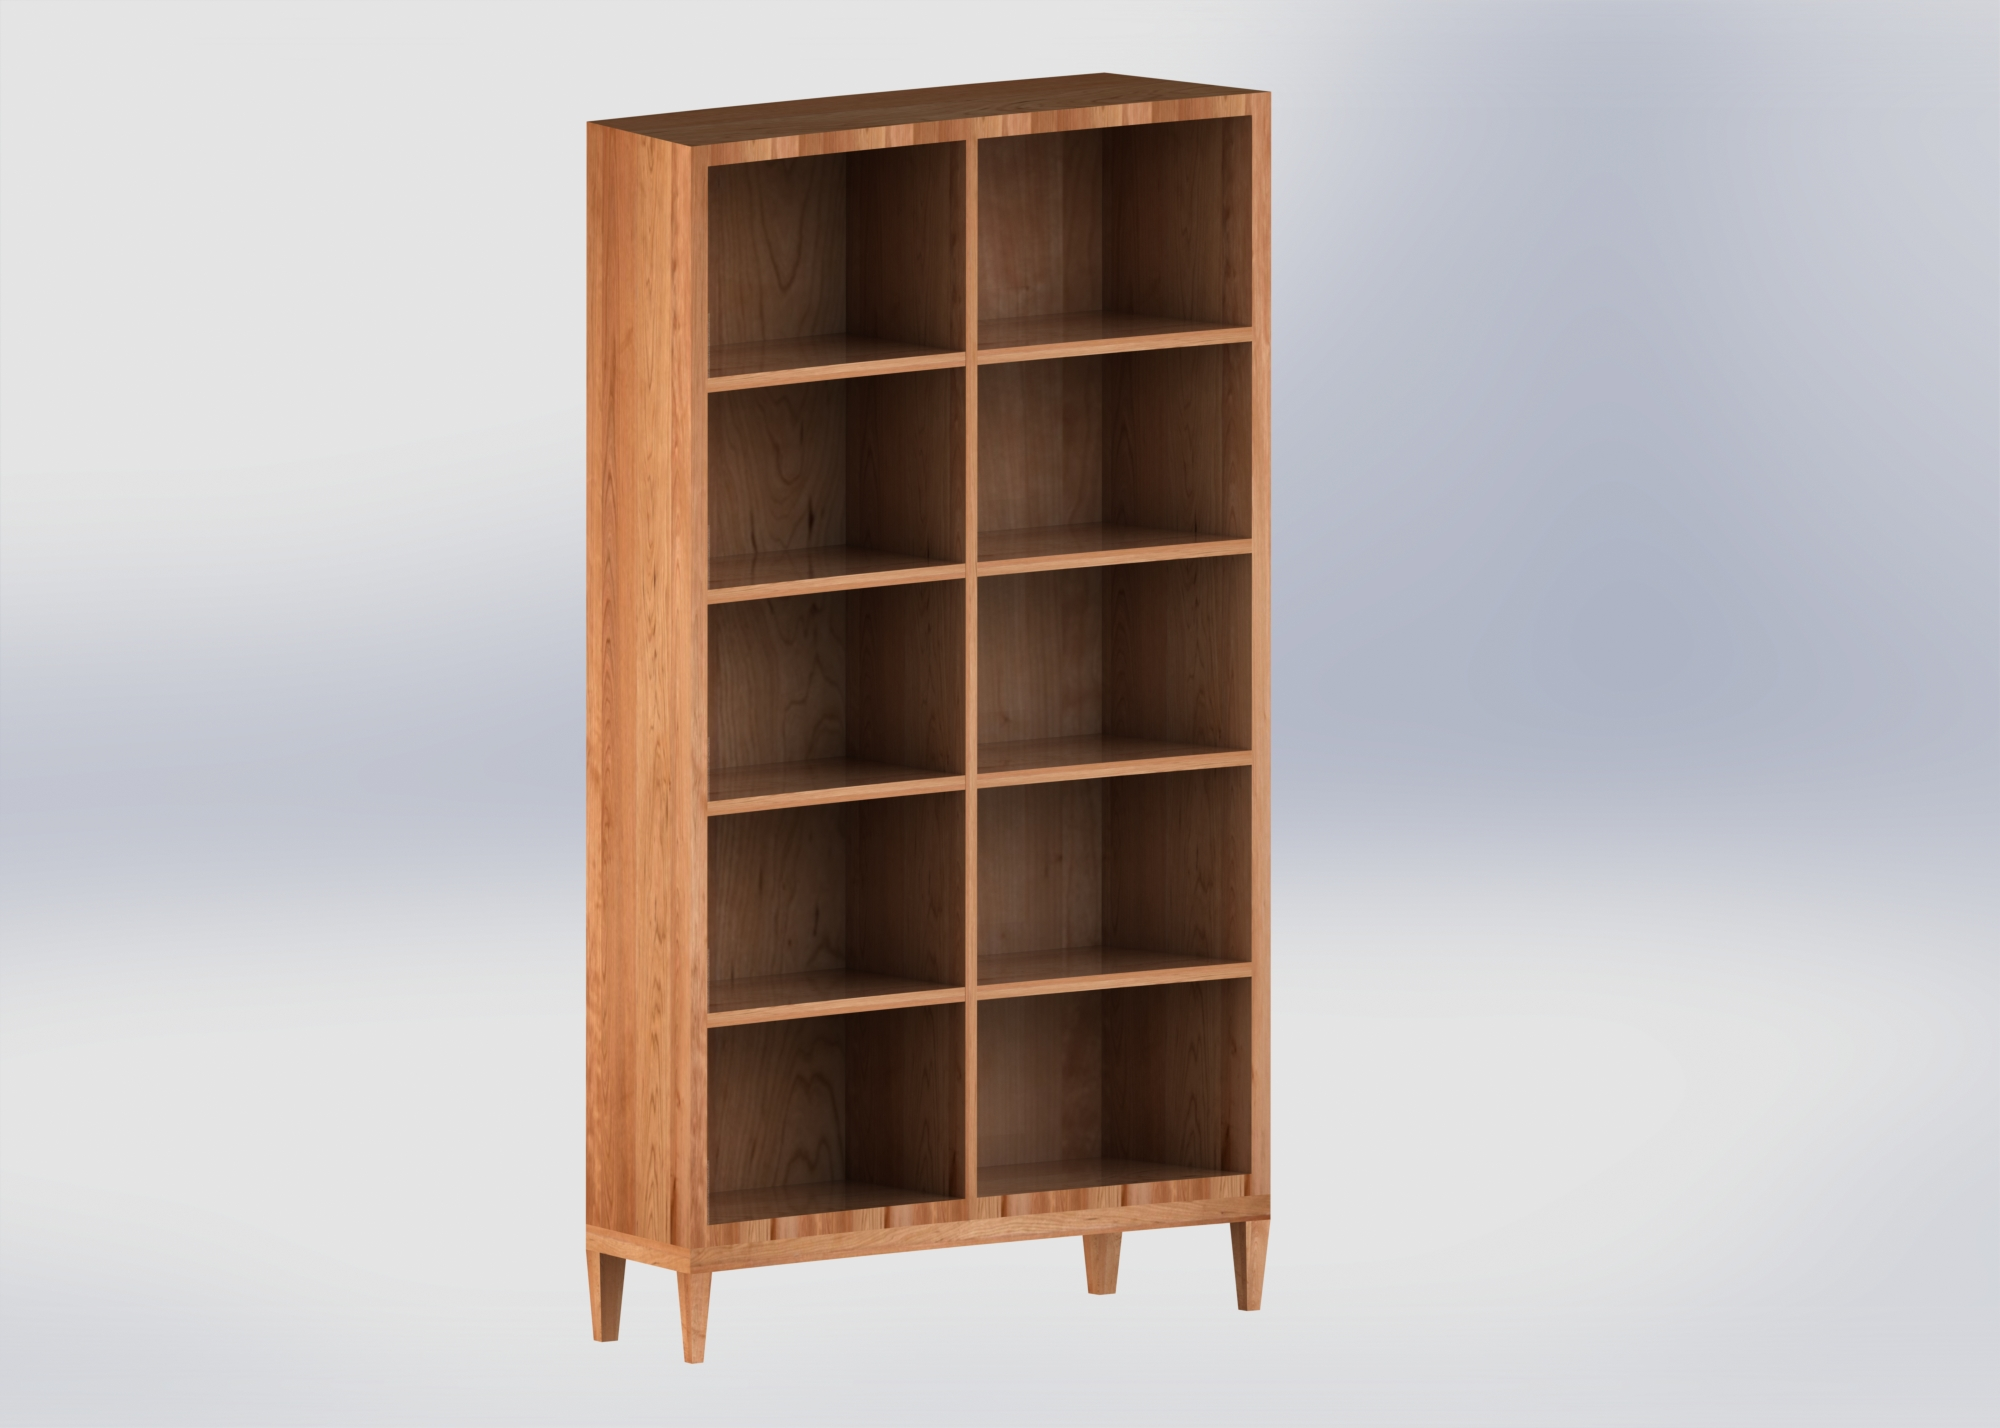 2_Part_Bookshelf.JPG